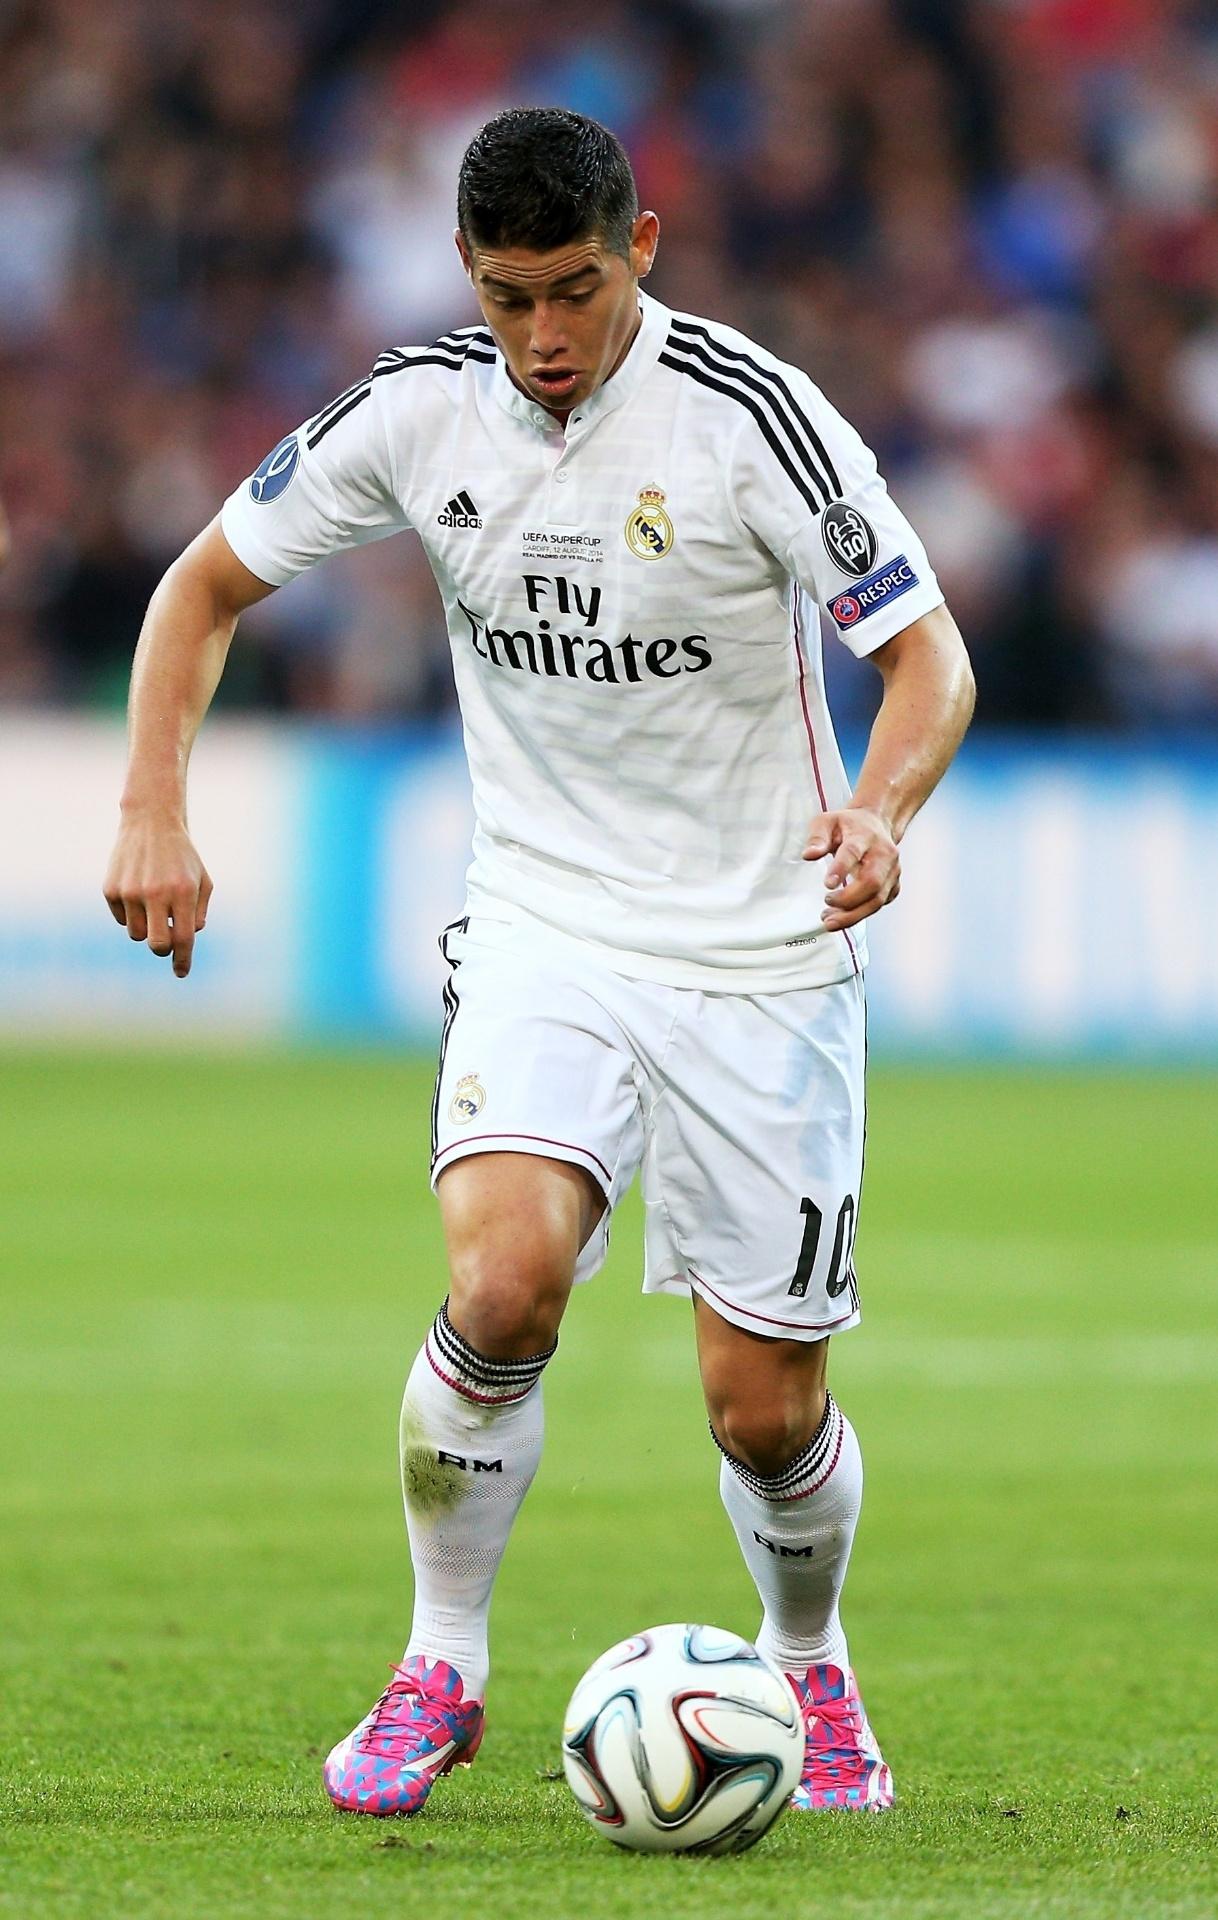 James Rodriguez tenta dominar bola na partida decisiva pela Supercopa da Europa, contra o Sevilla